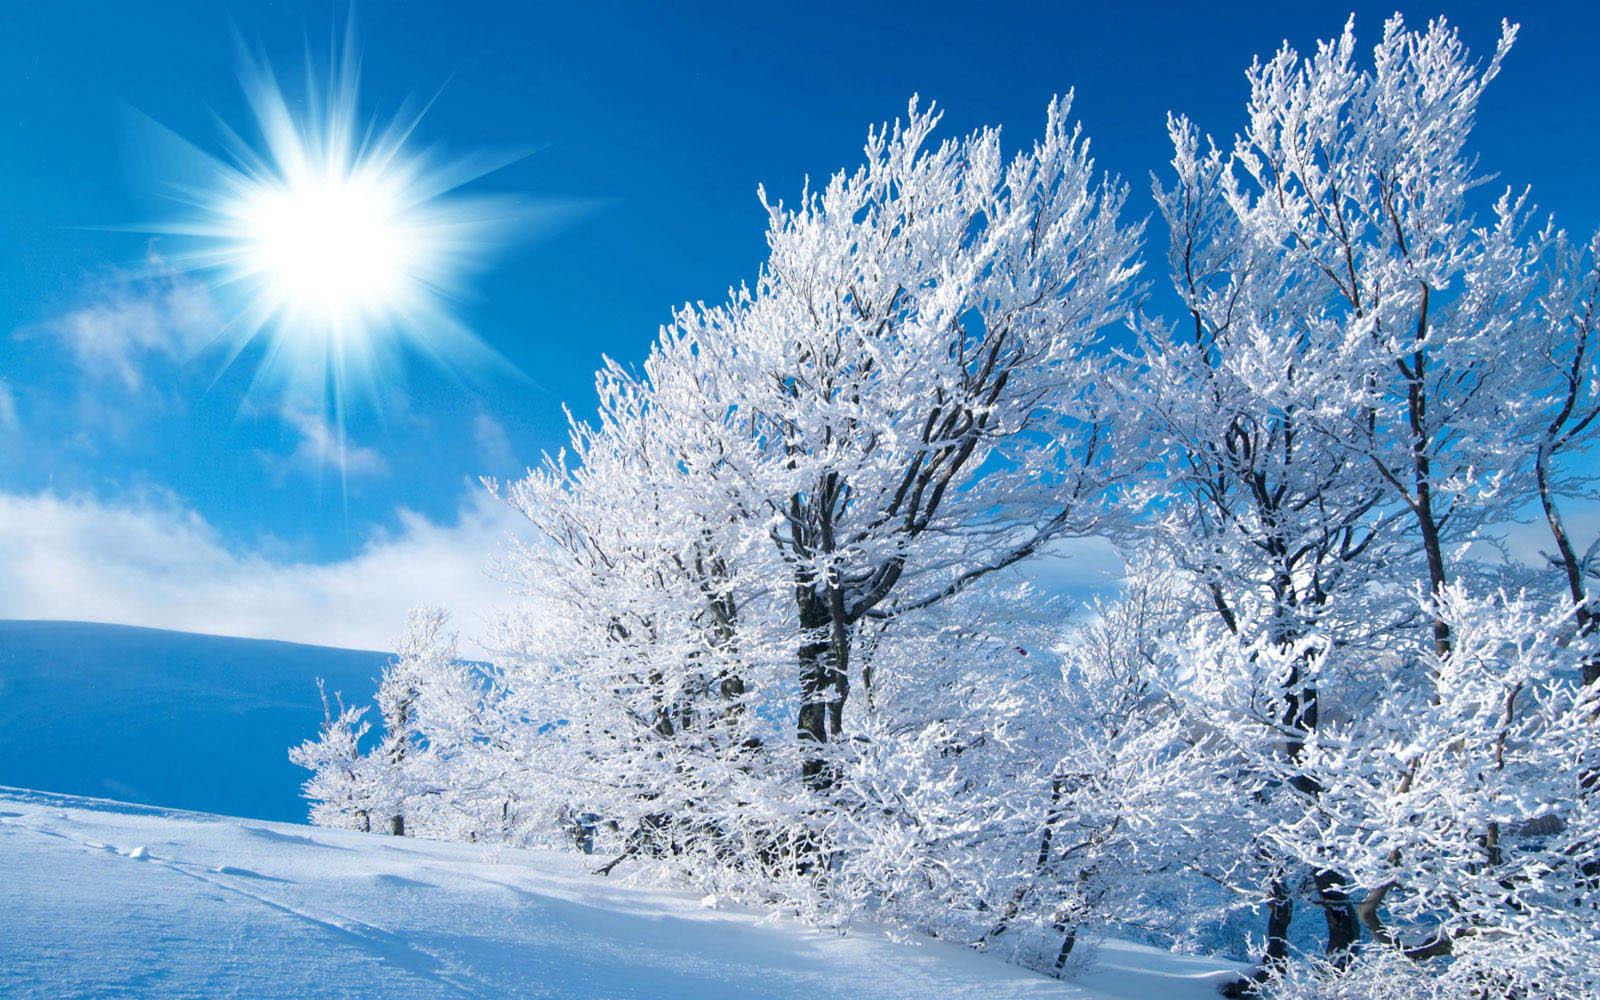 Winter Season Wallpaper 1600x1000